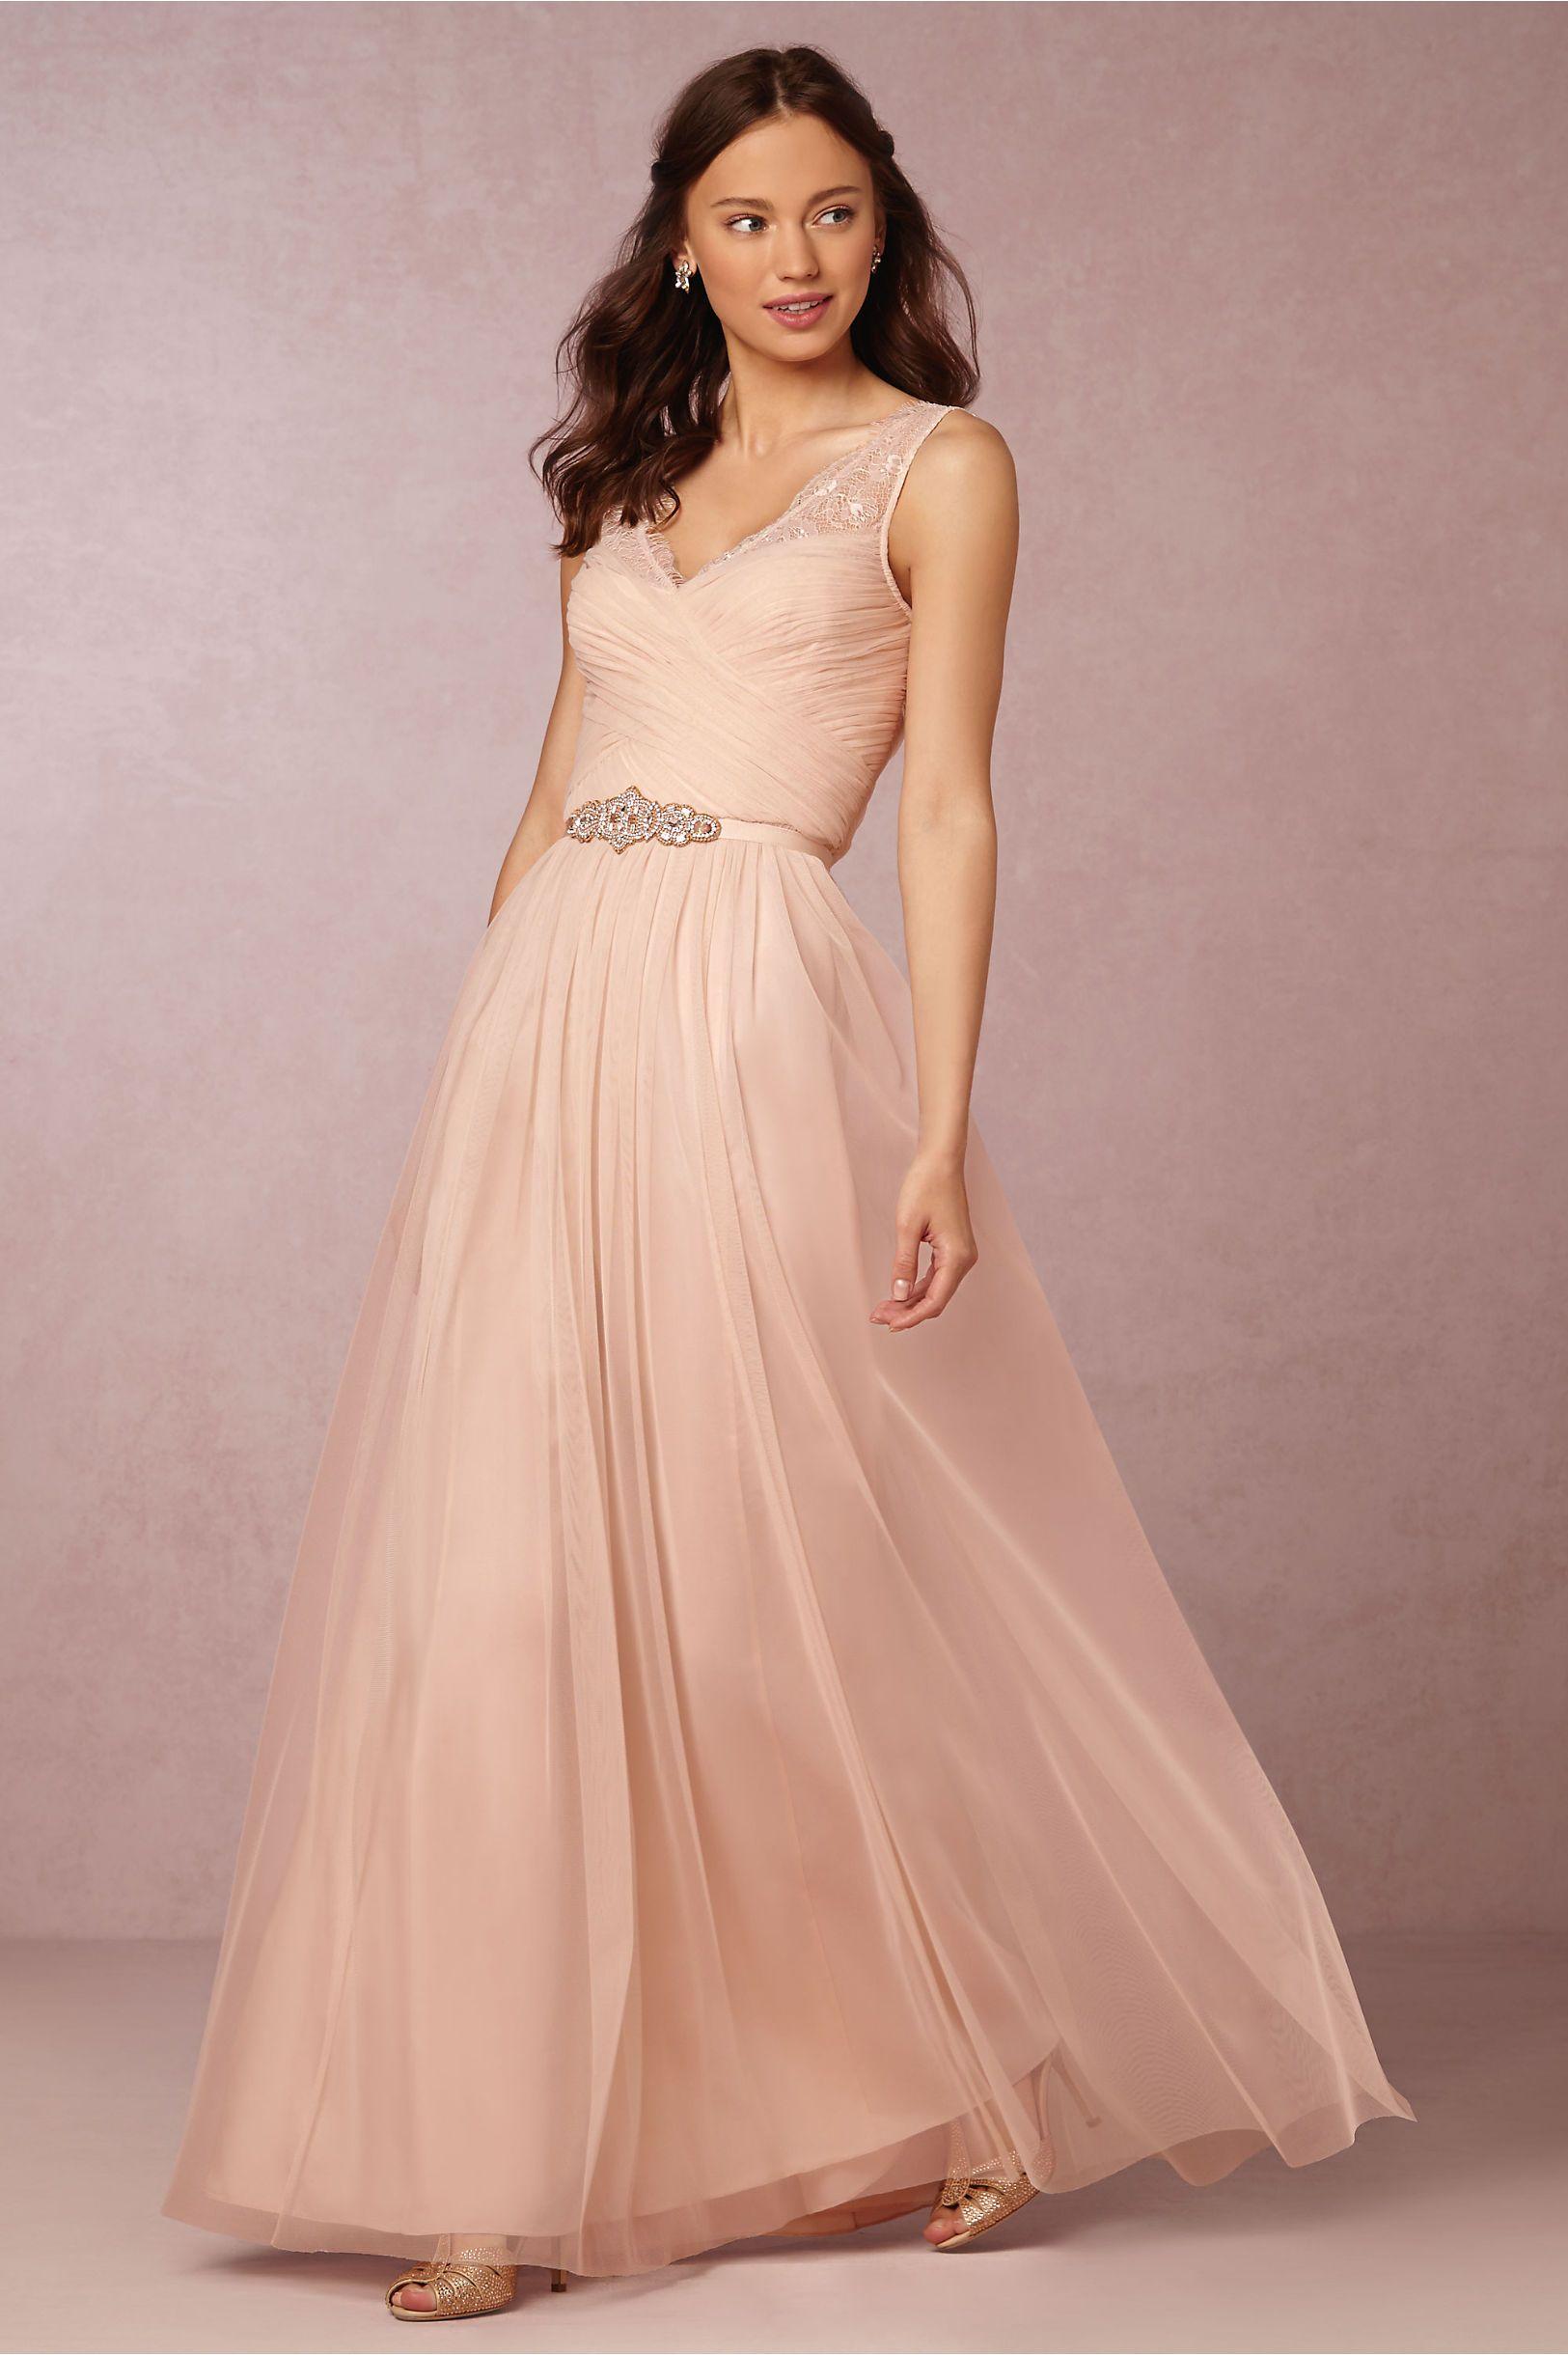 Fleur Bridesmaids Dress In Blush From Bhldn